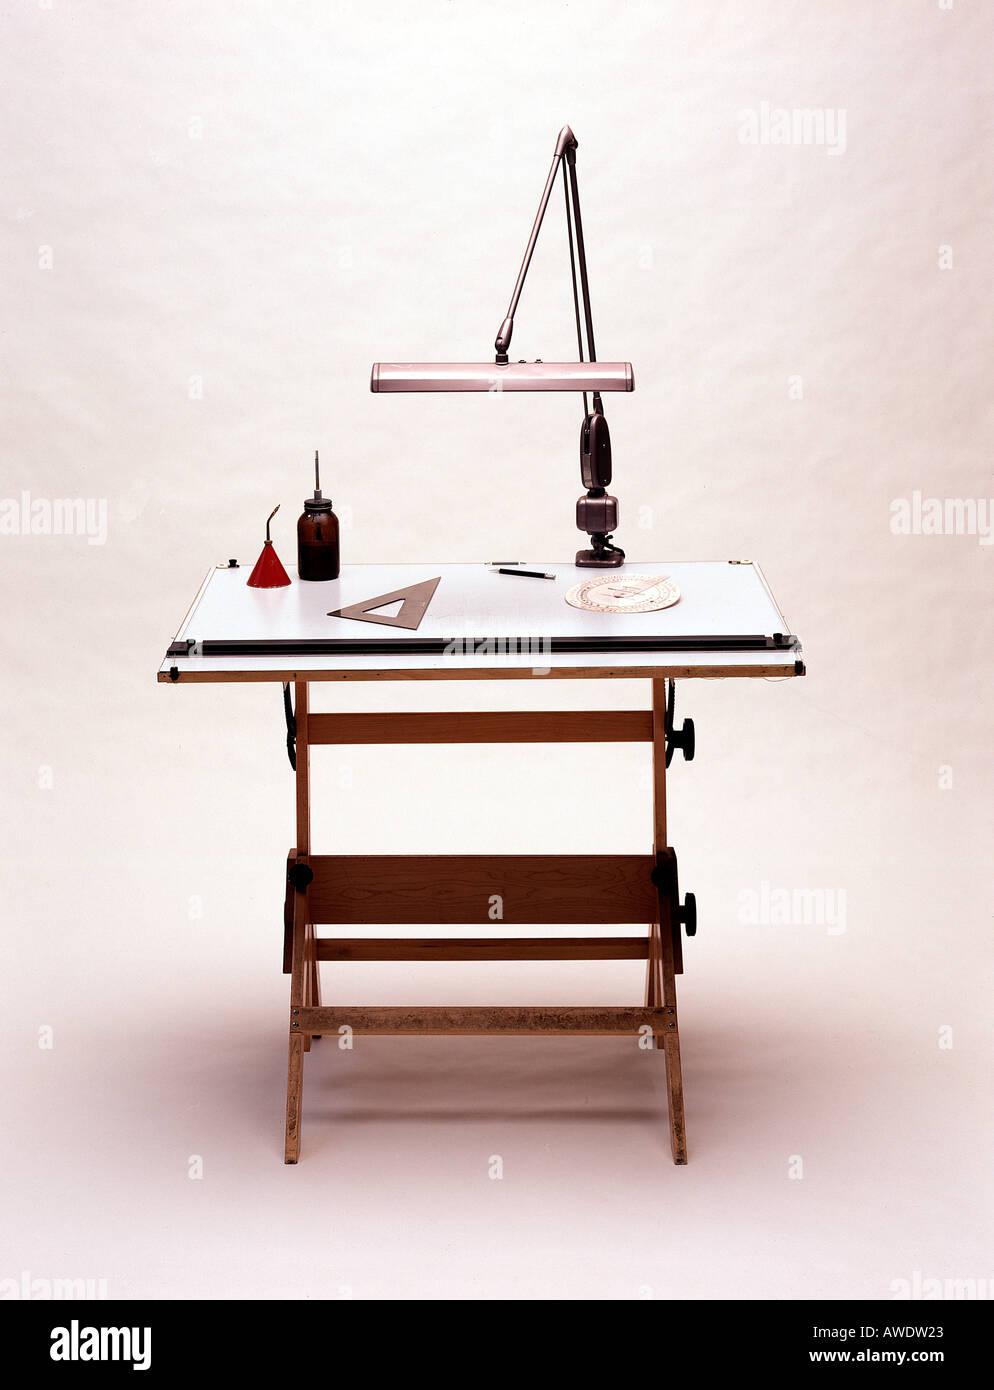 Drafting draftsman architect designer engineer work table lamp tools drafting draftsman architect designer engineer work table lamp tools triangle graphic arts desk lamp aloadofball Images